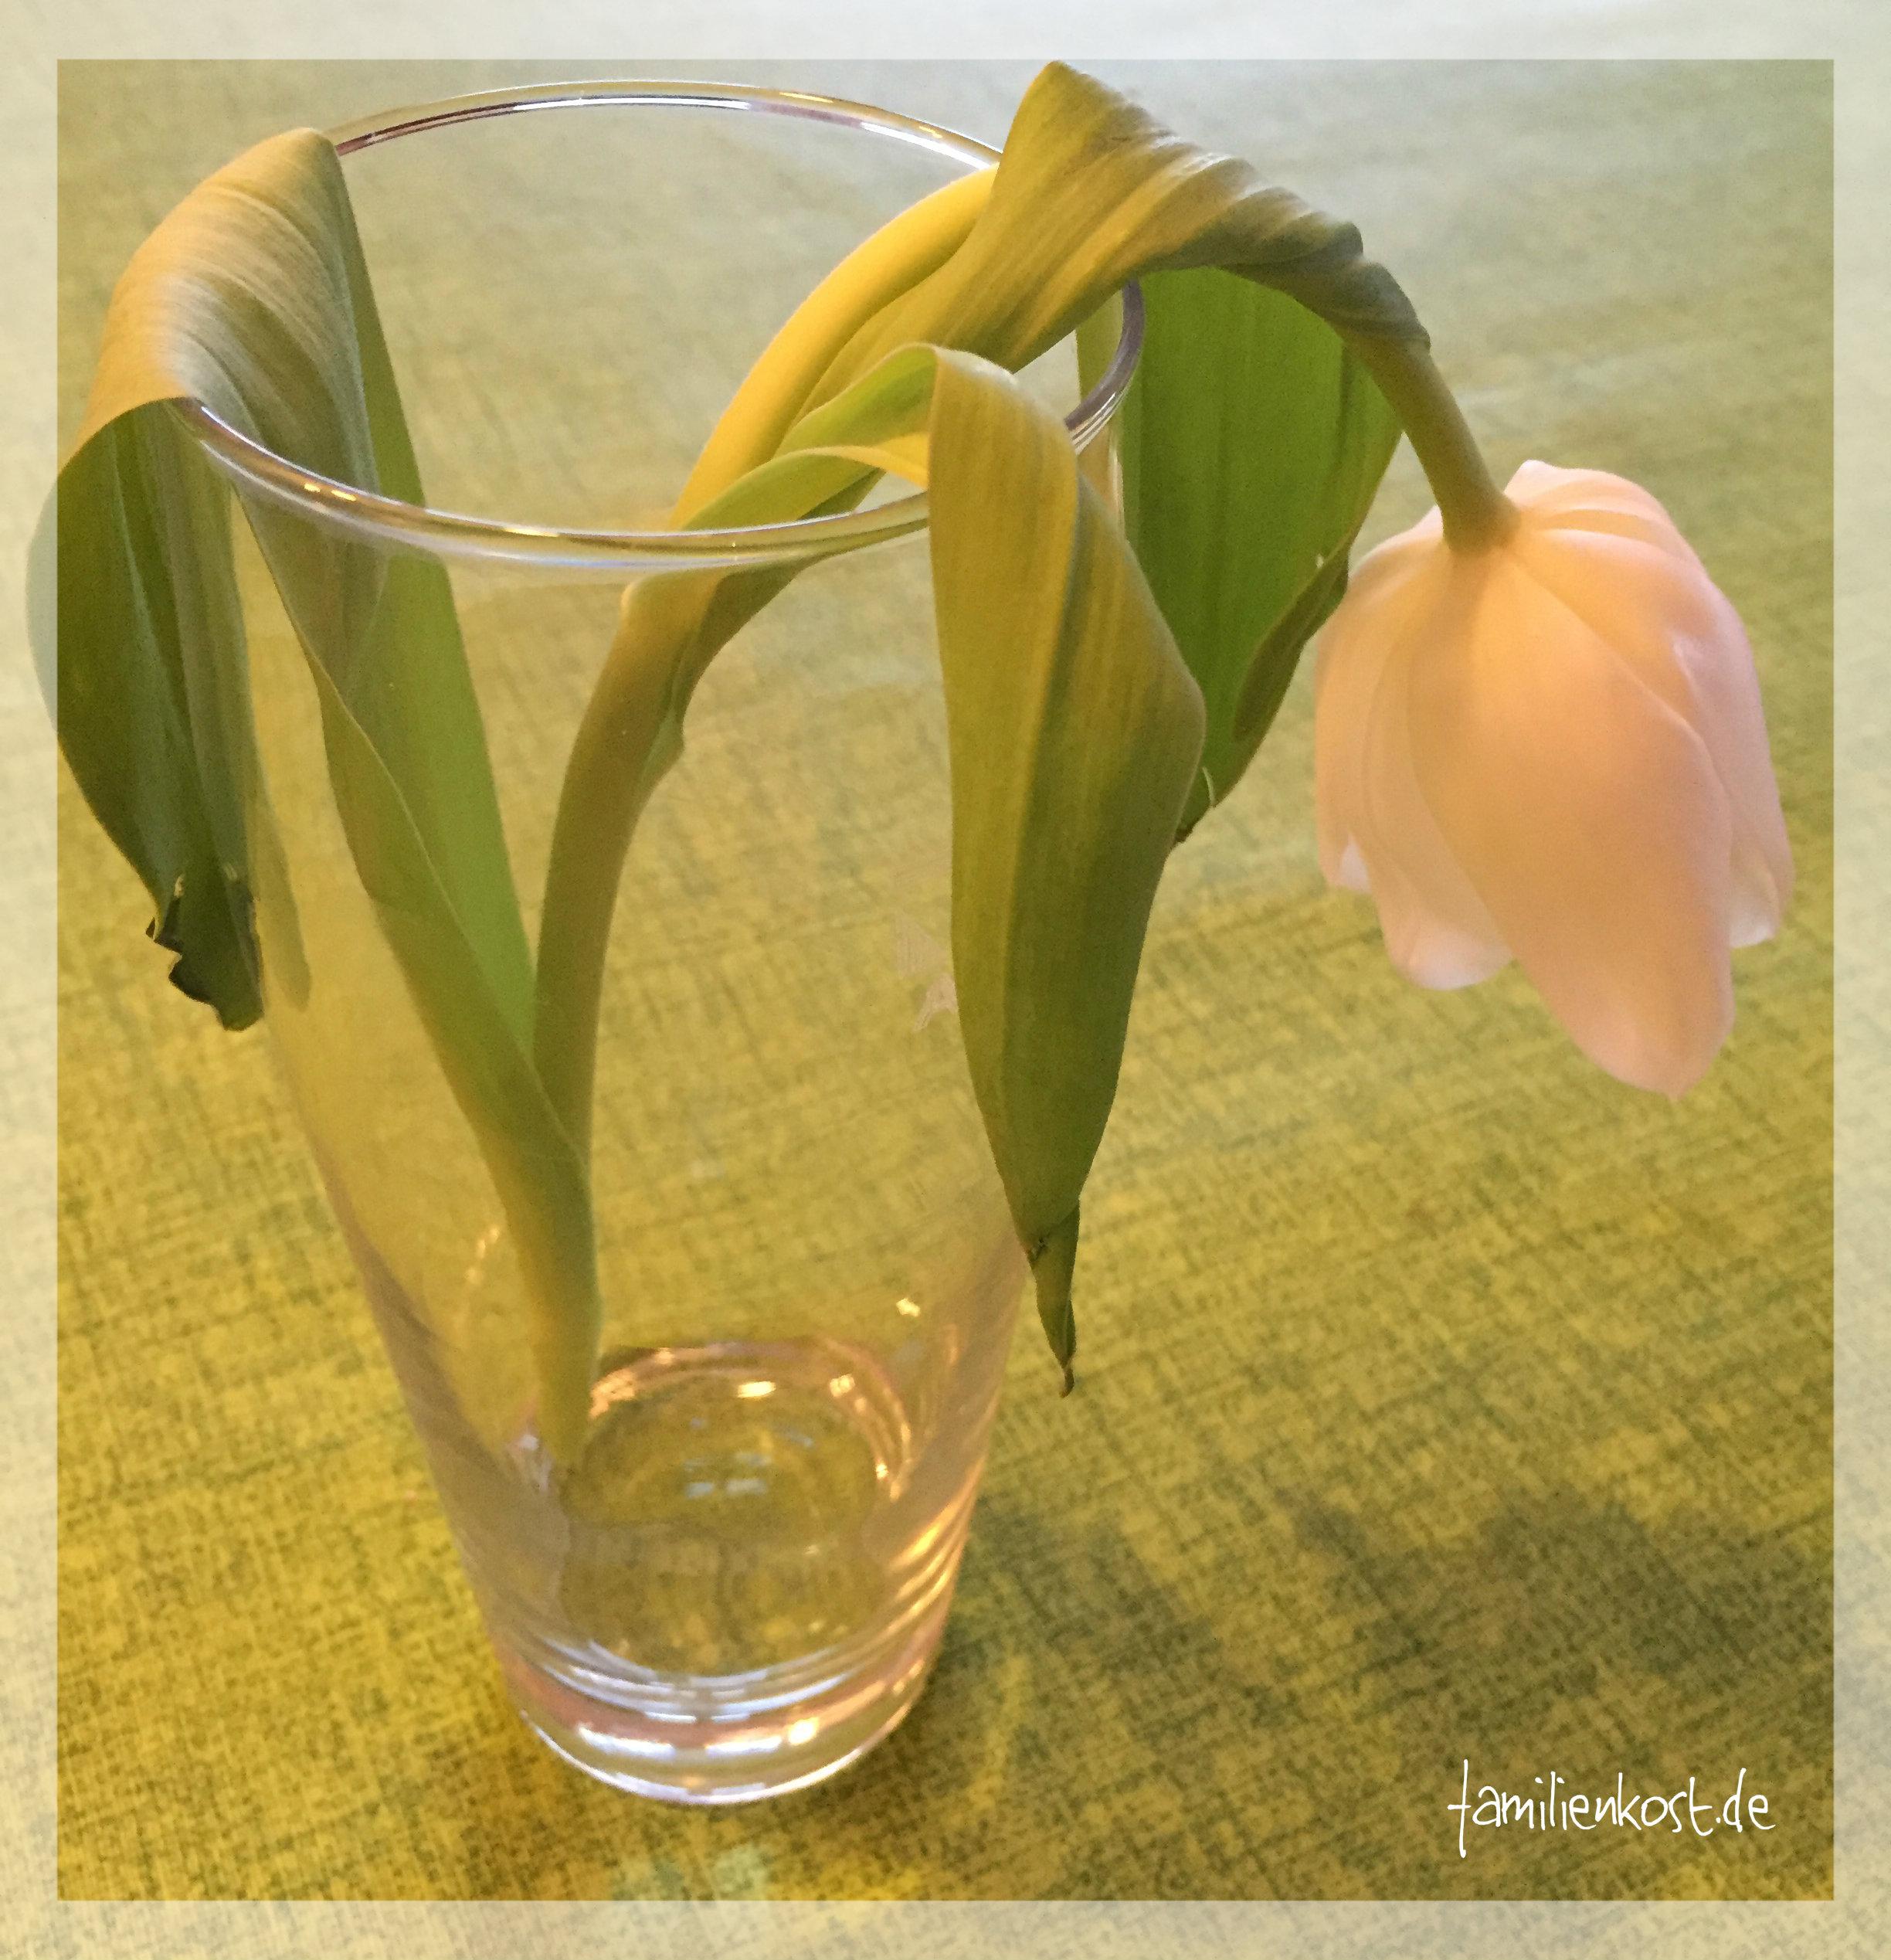 Blumen mit Lebensmittelfarbe selber färben: Experiment